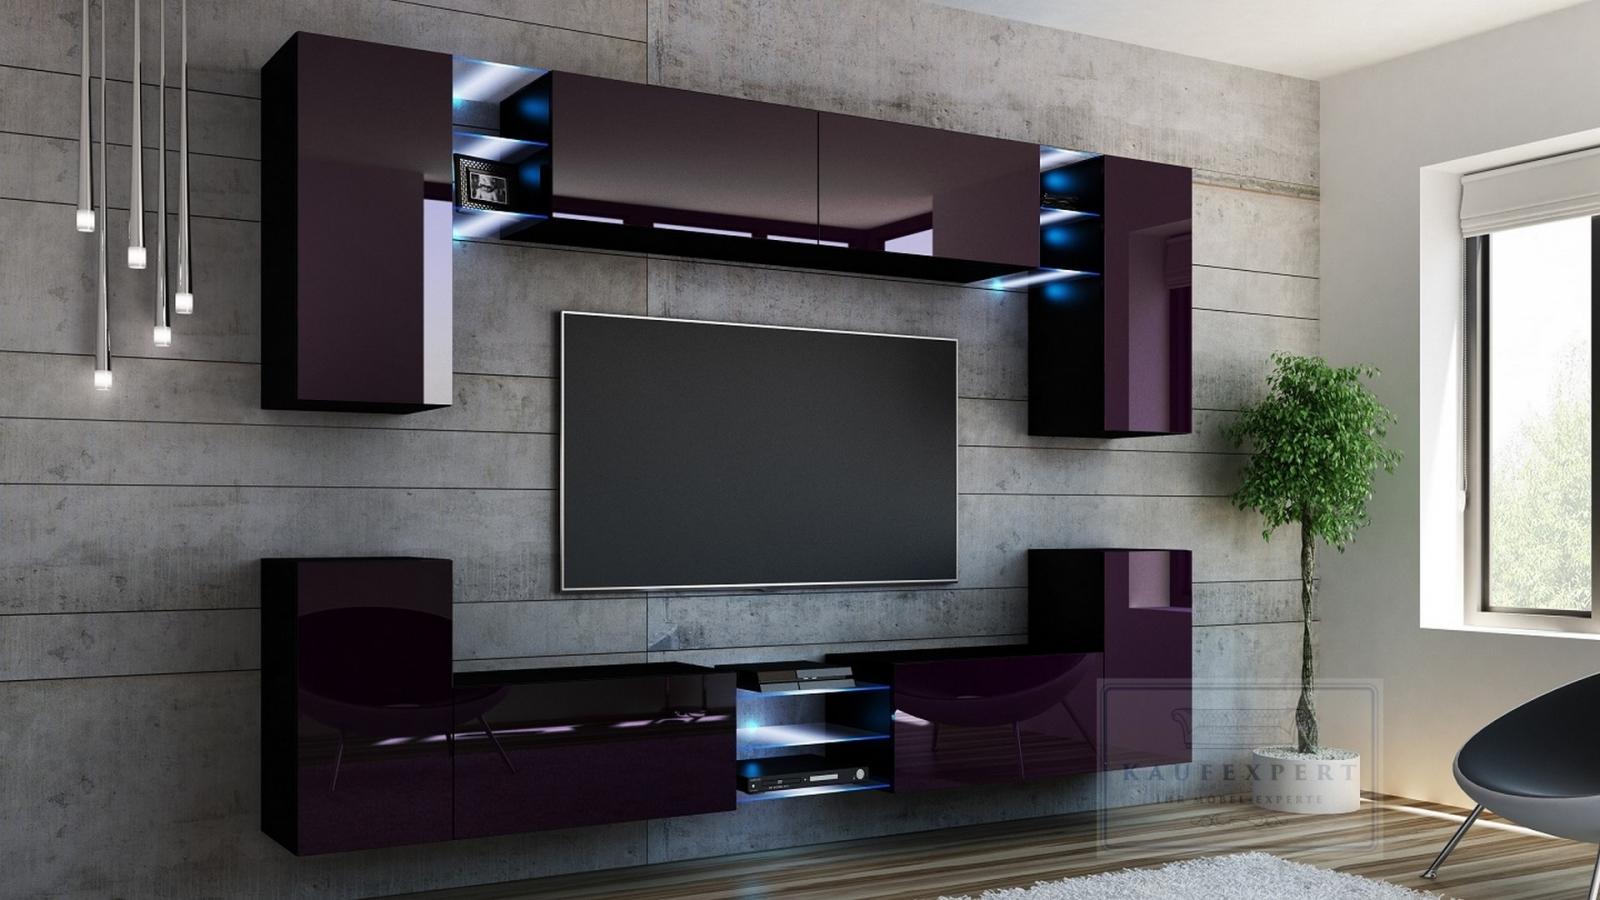 led tv wand awesome led tv wand nett led tv wand selber. Black Bedroom Furniture Sets. Home Design Ideas